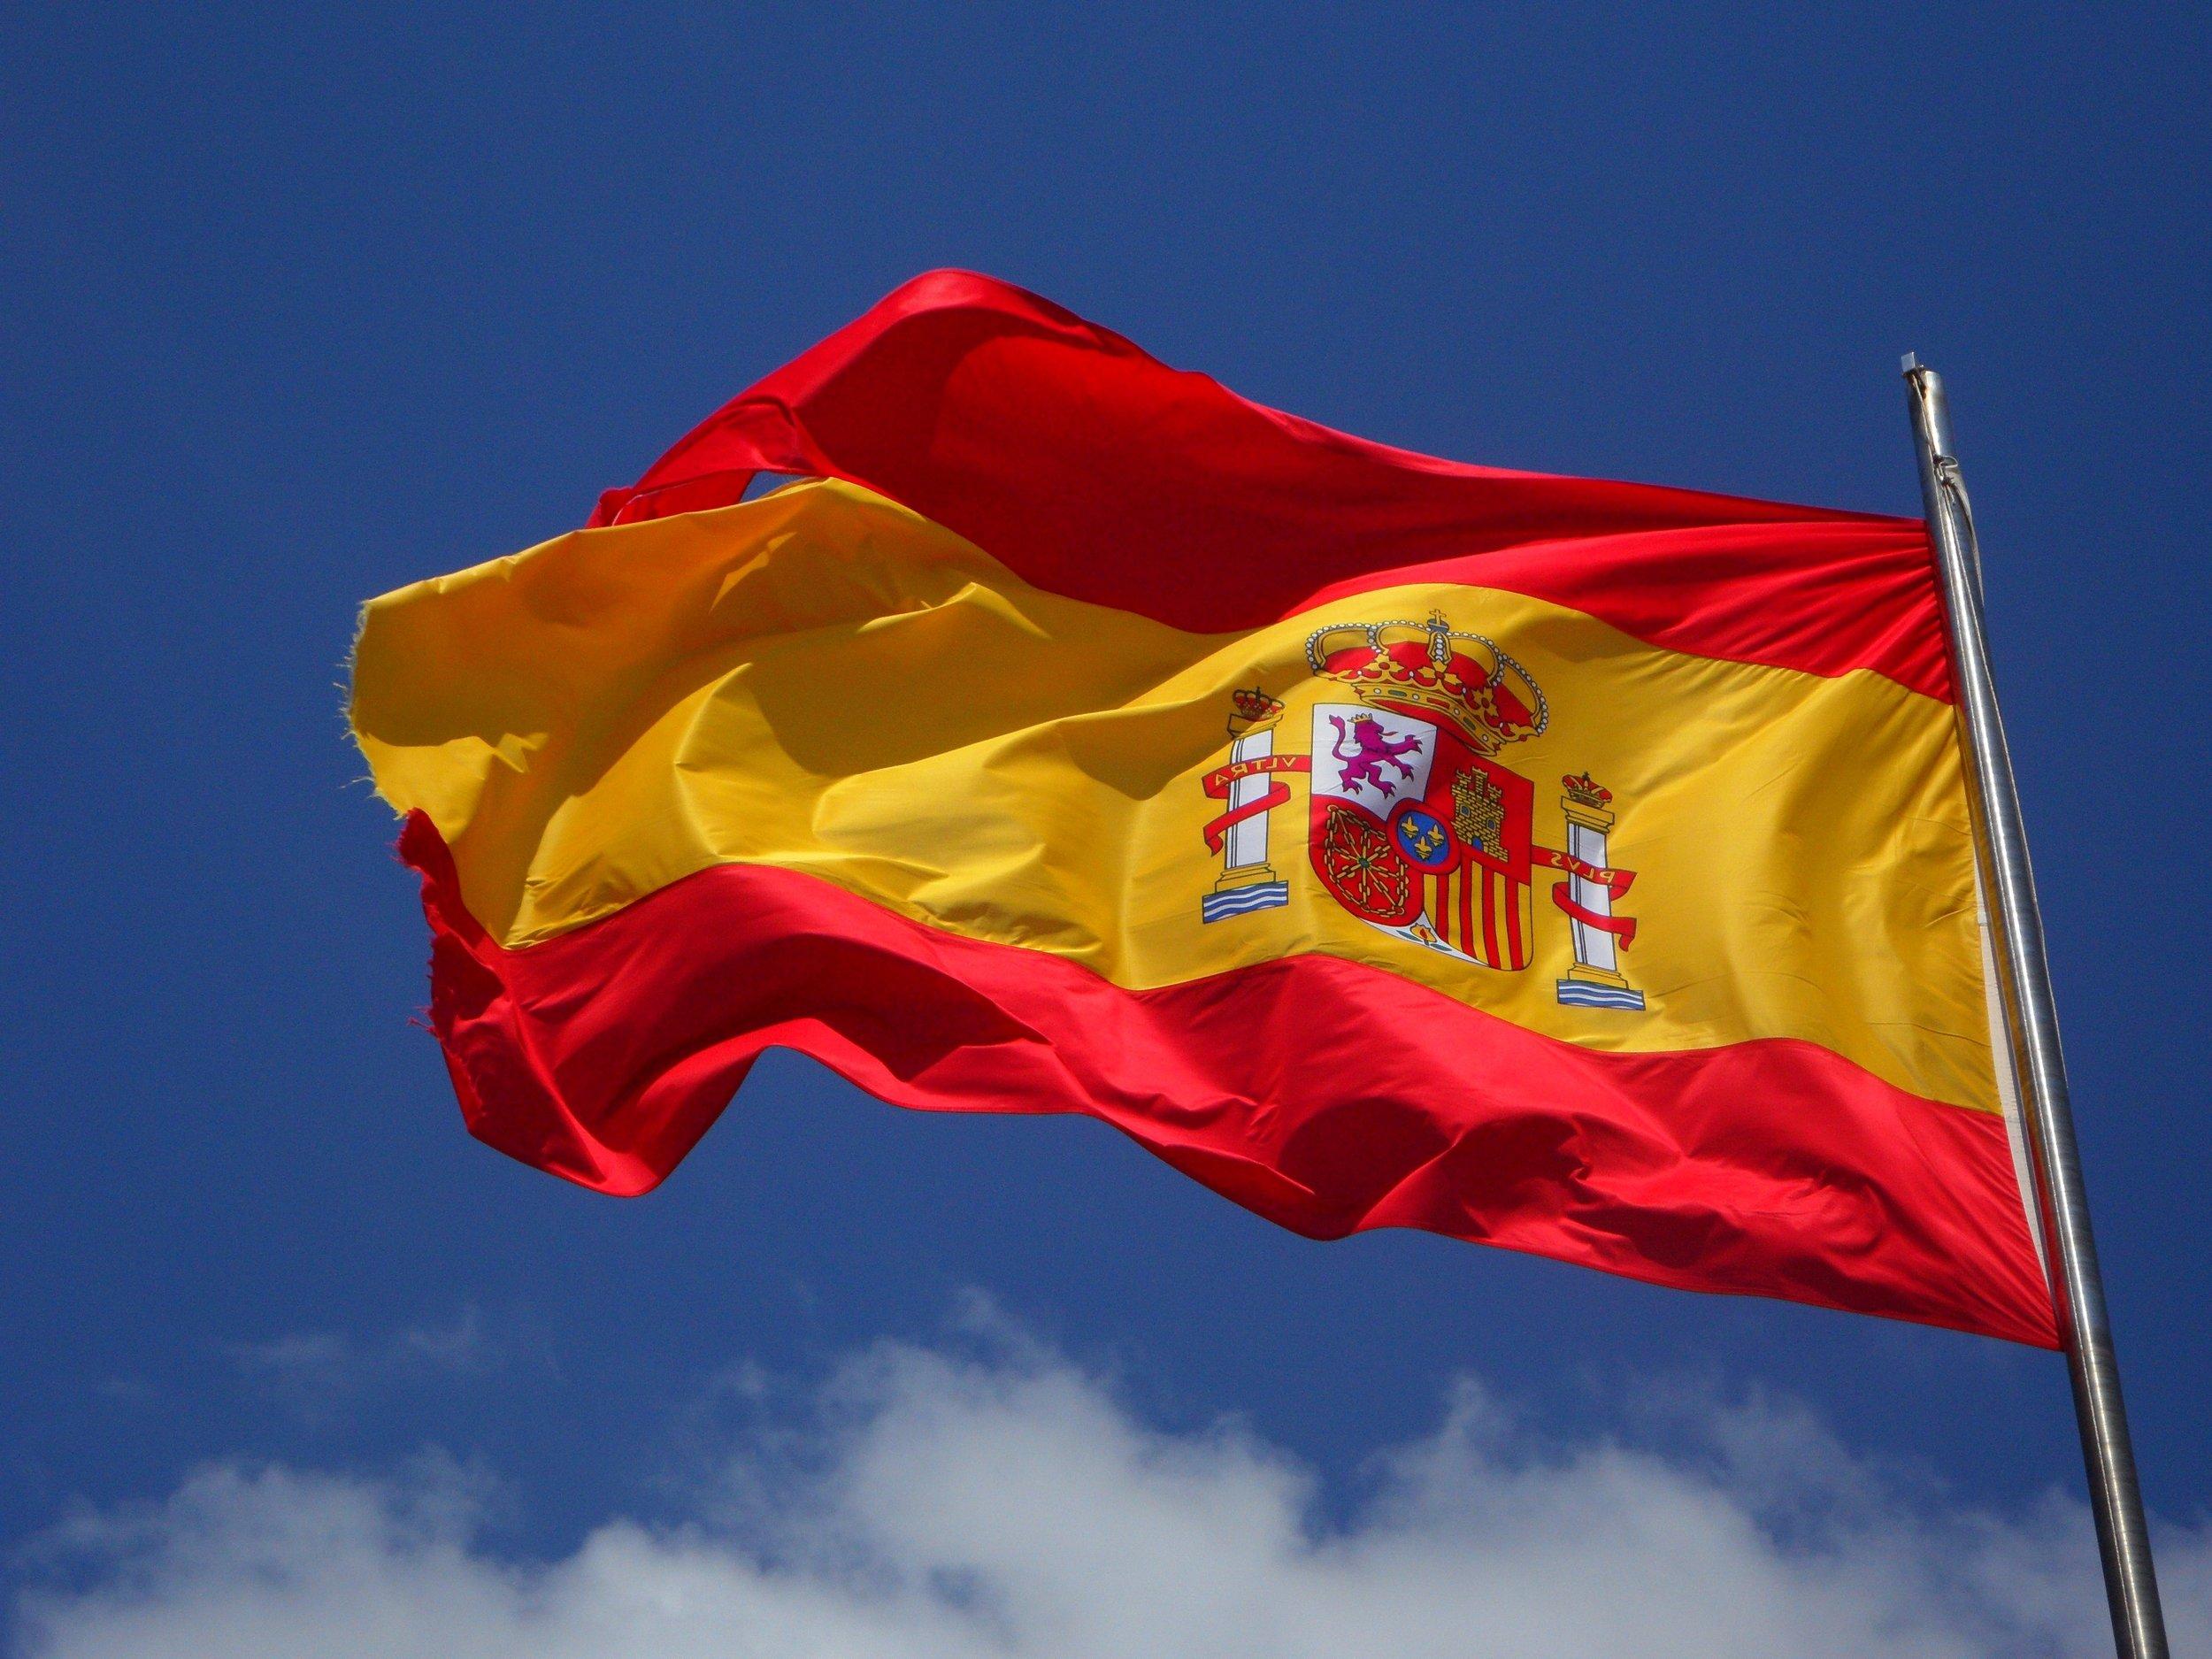 flagpole-spain-spanish-54097.jpg